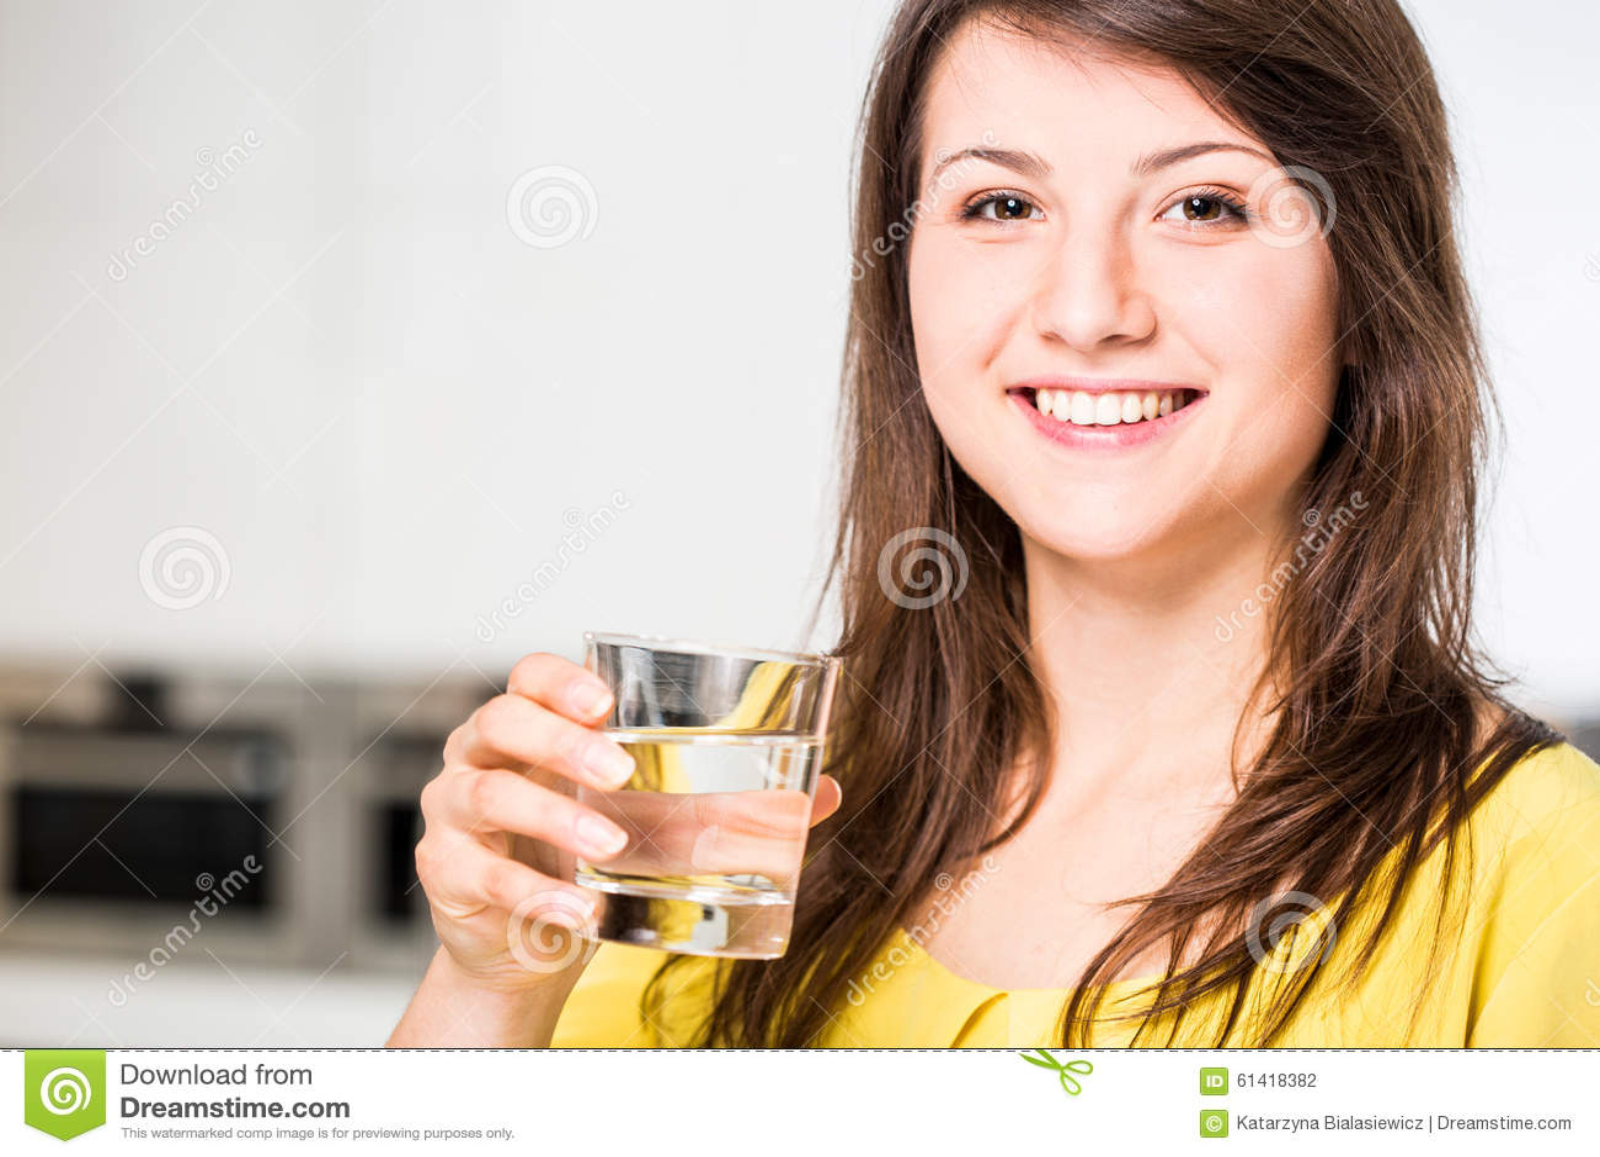 Habit of drinking water